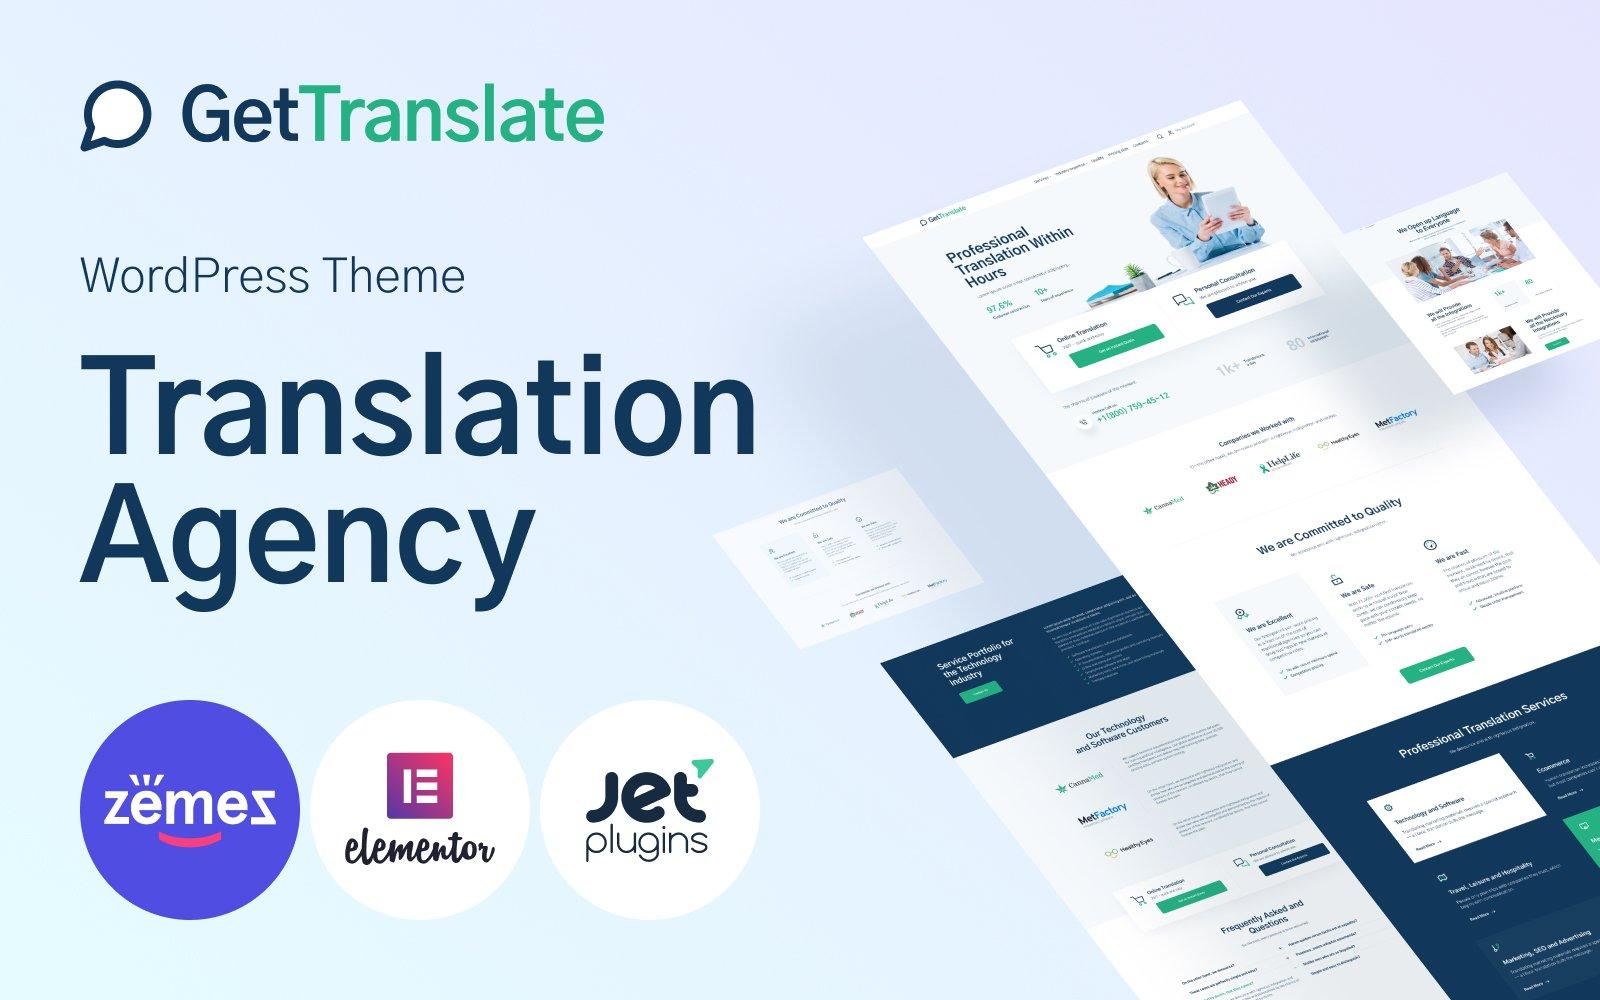 GetTranslate - Translation Agency WordPress Theme